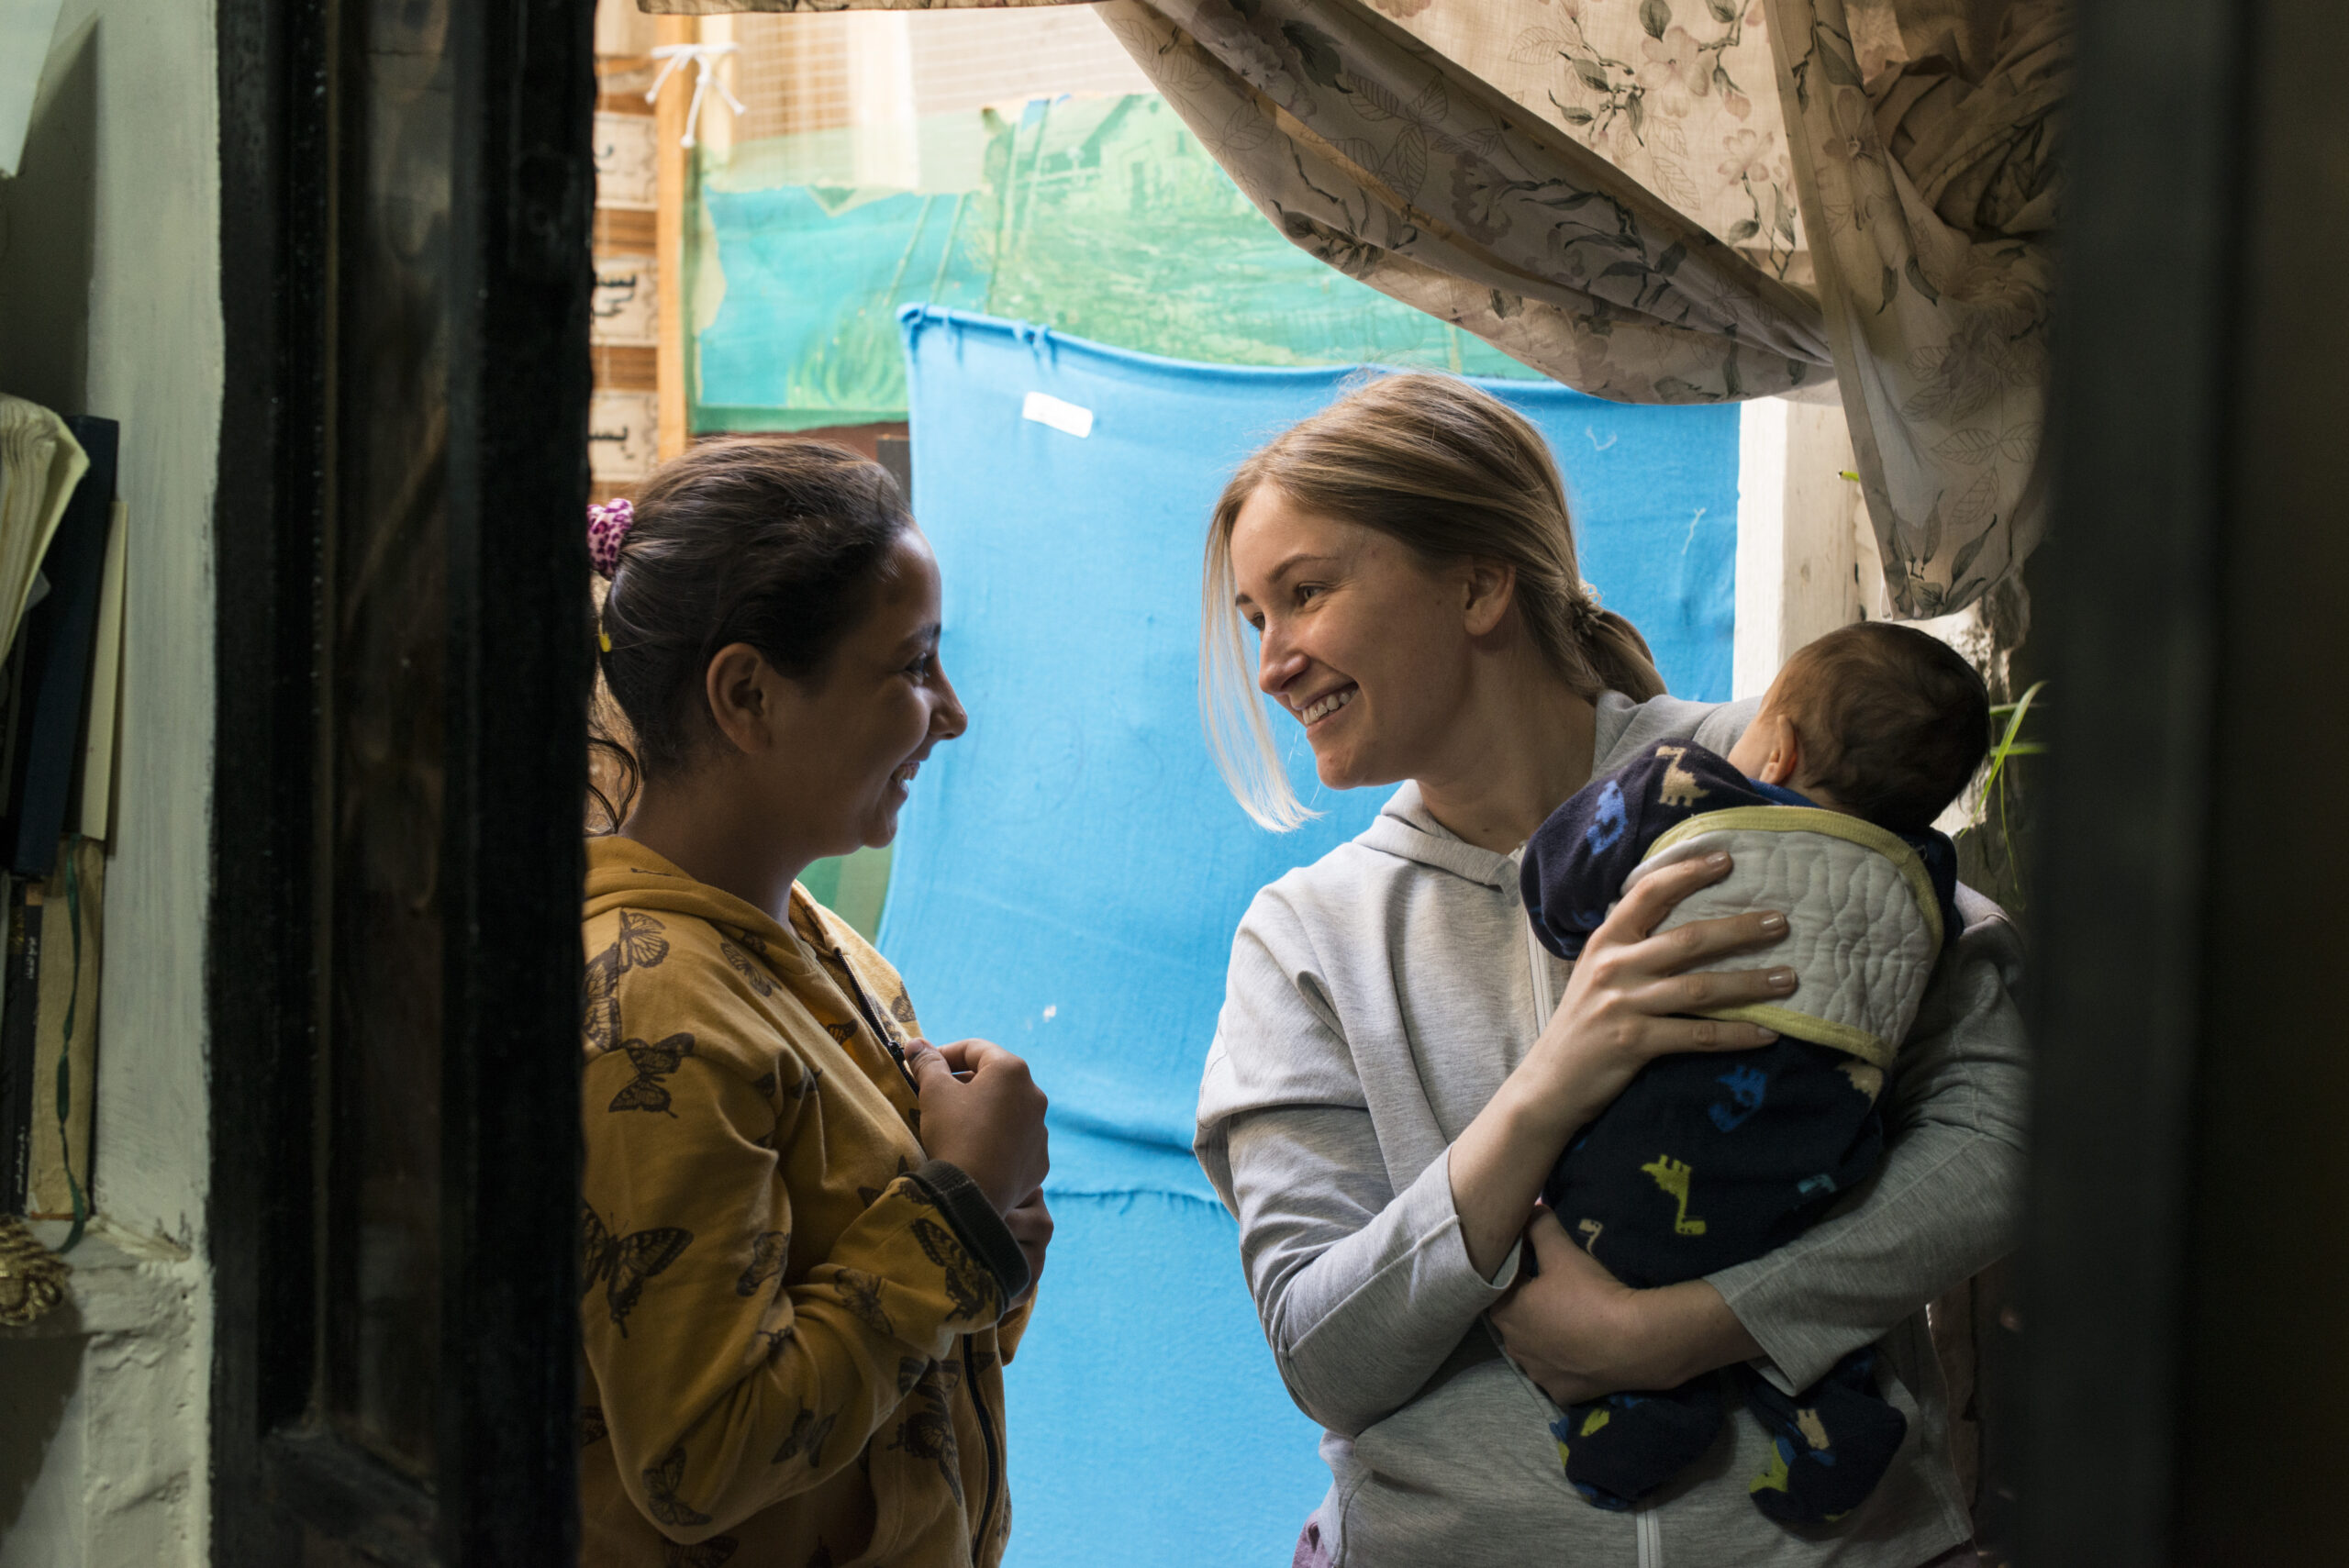 Millie philantrhopy e commerce brand for world refugee day